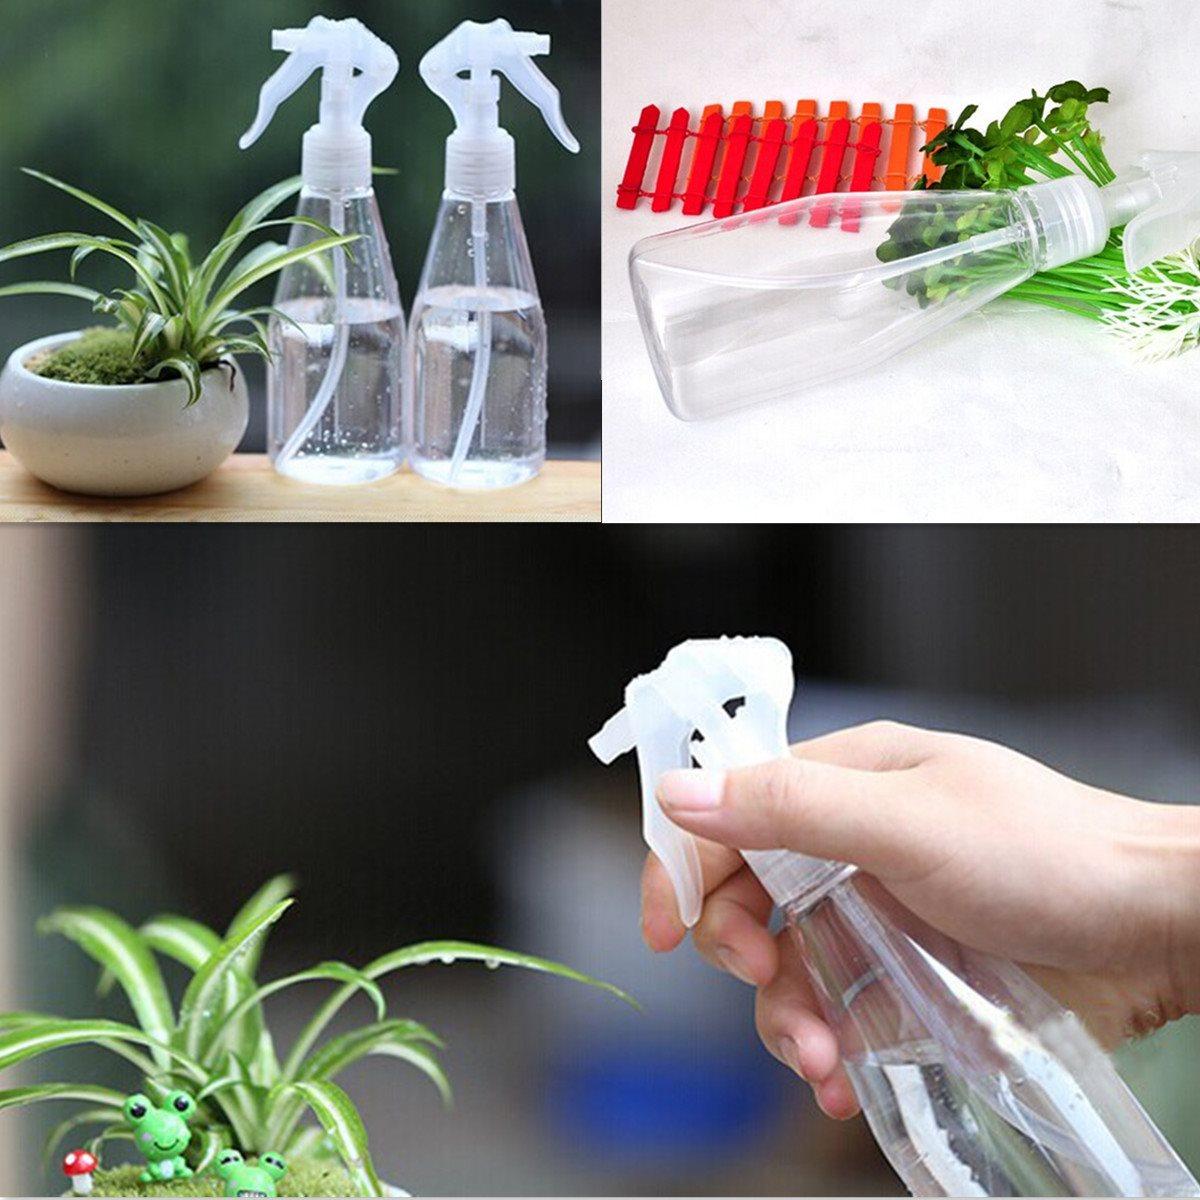 200ml Plastic Spray Bottle Bonsai Tools Moss Micro Landscape Fine Mist Refillable Perfume Spray Bottle 5x13cm(China (Mainland))